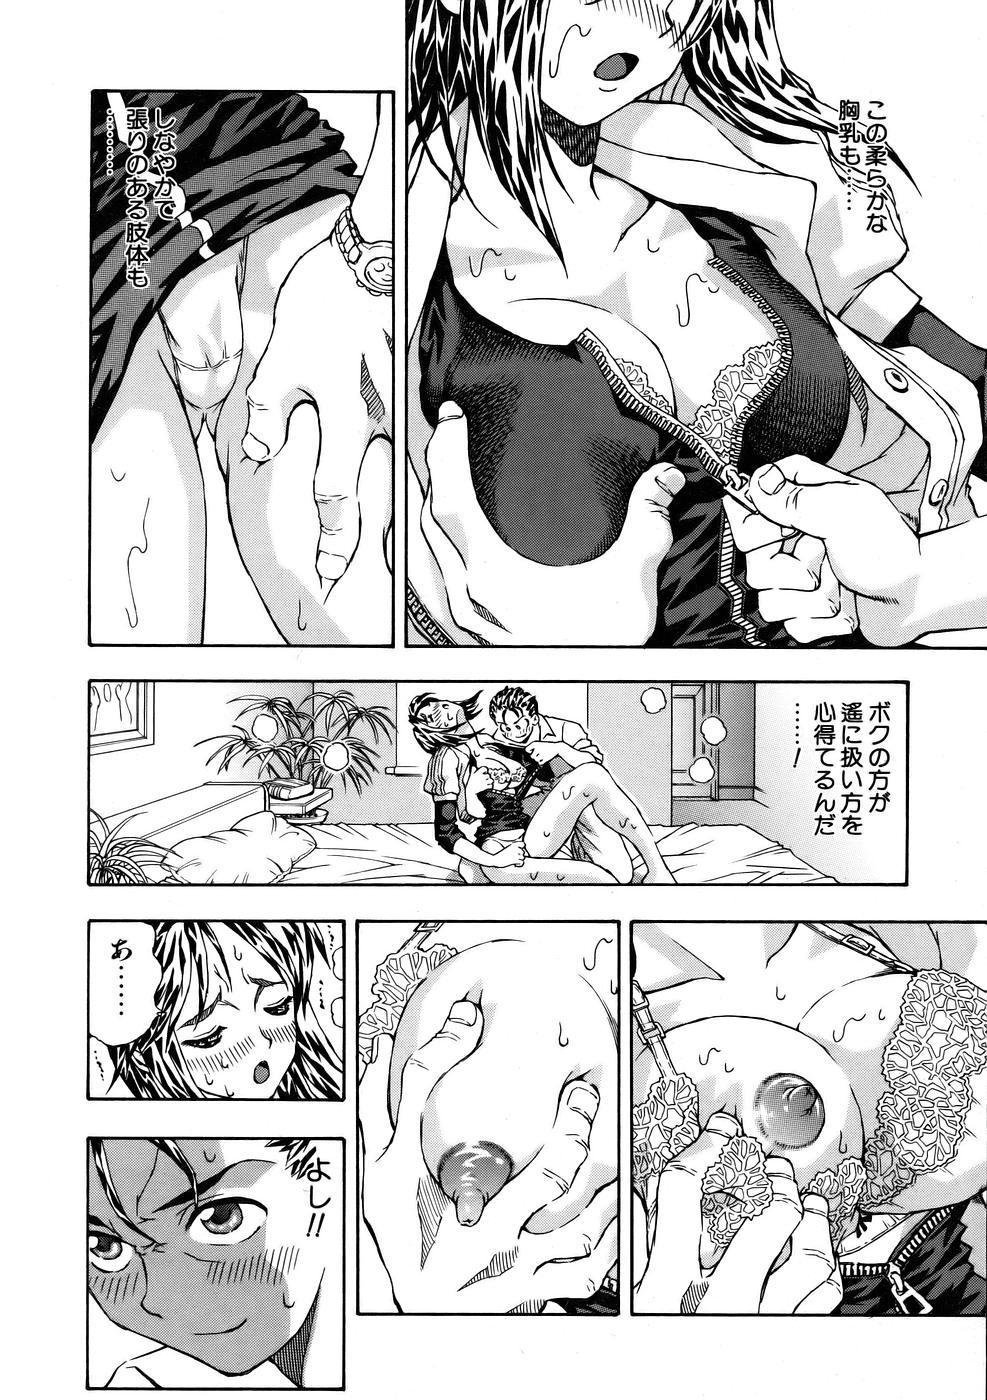 COMIC AUN 2005-10 Vol. 113 355